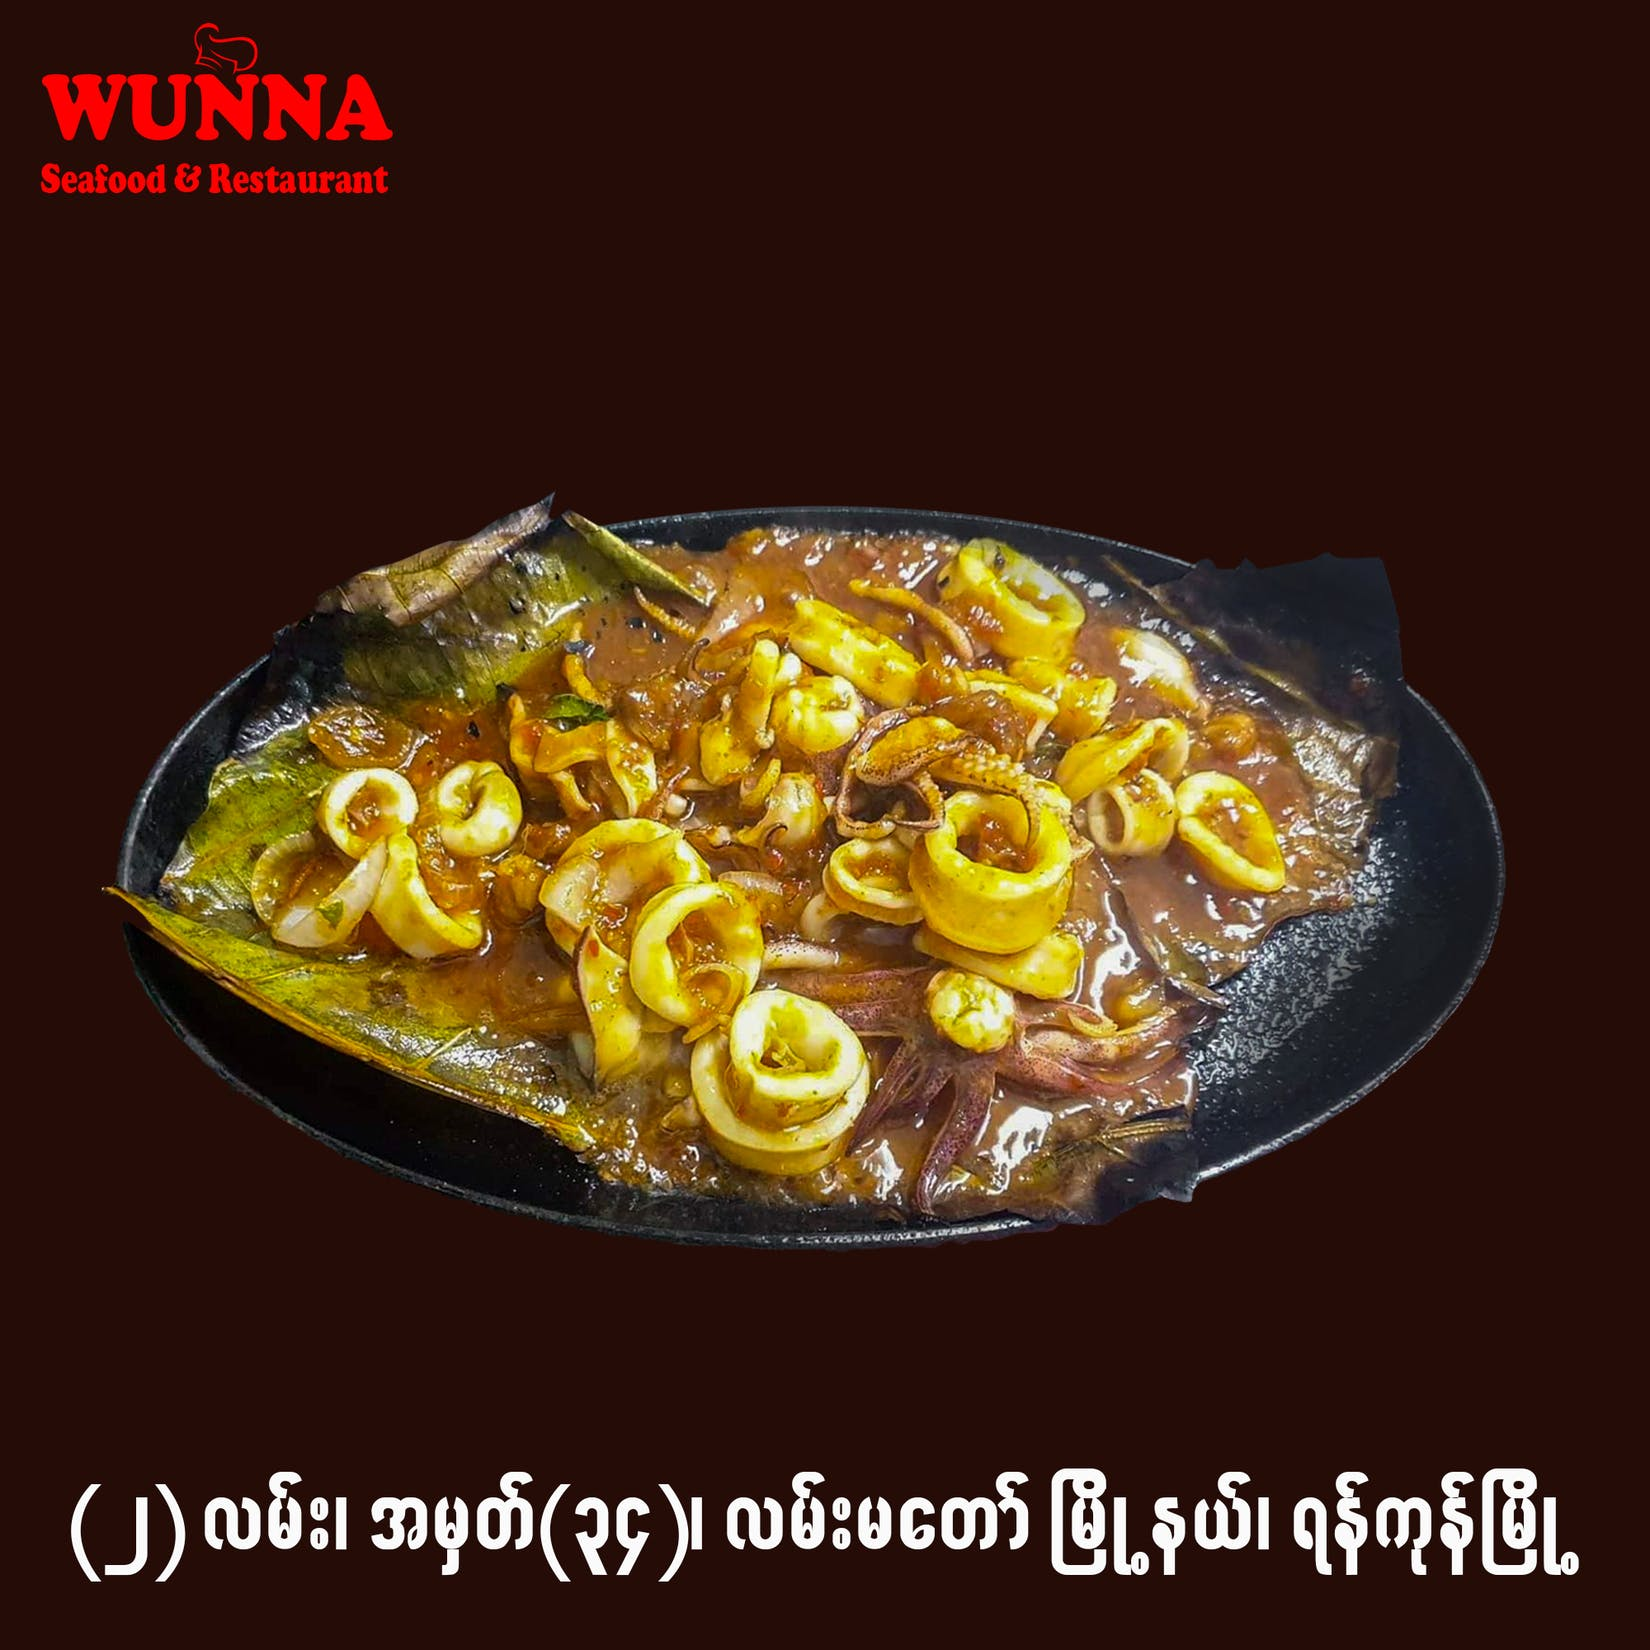 WUNNA Seafood & Restaurant | yathar